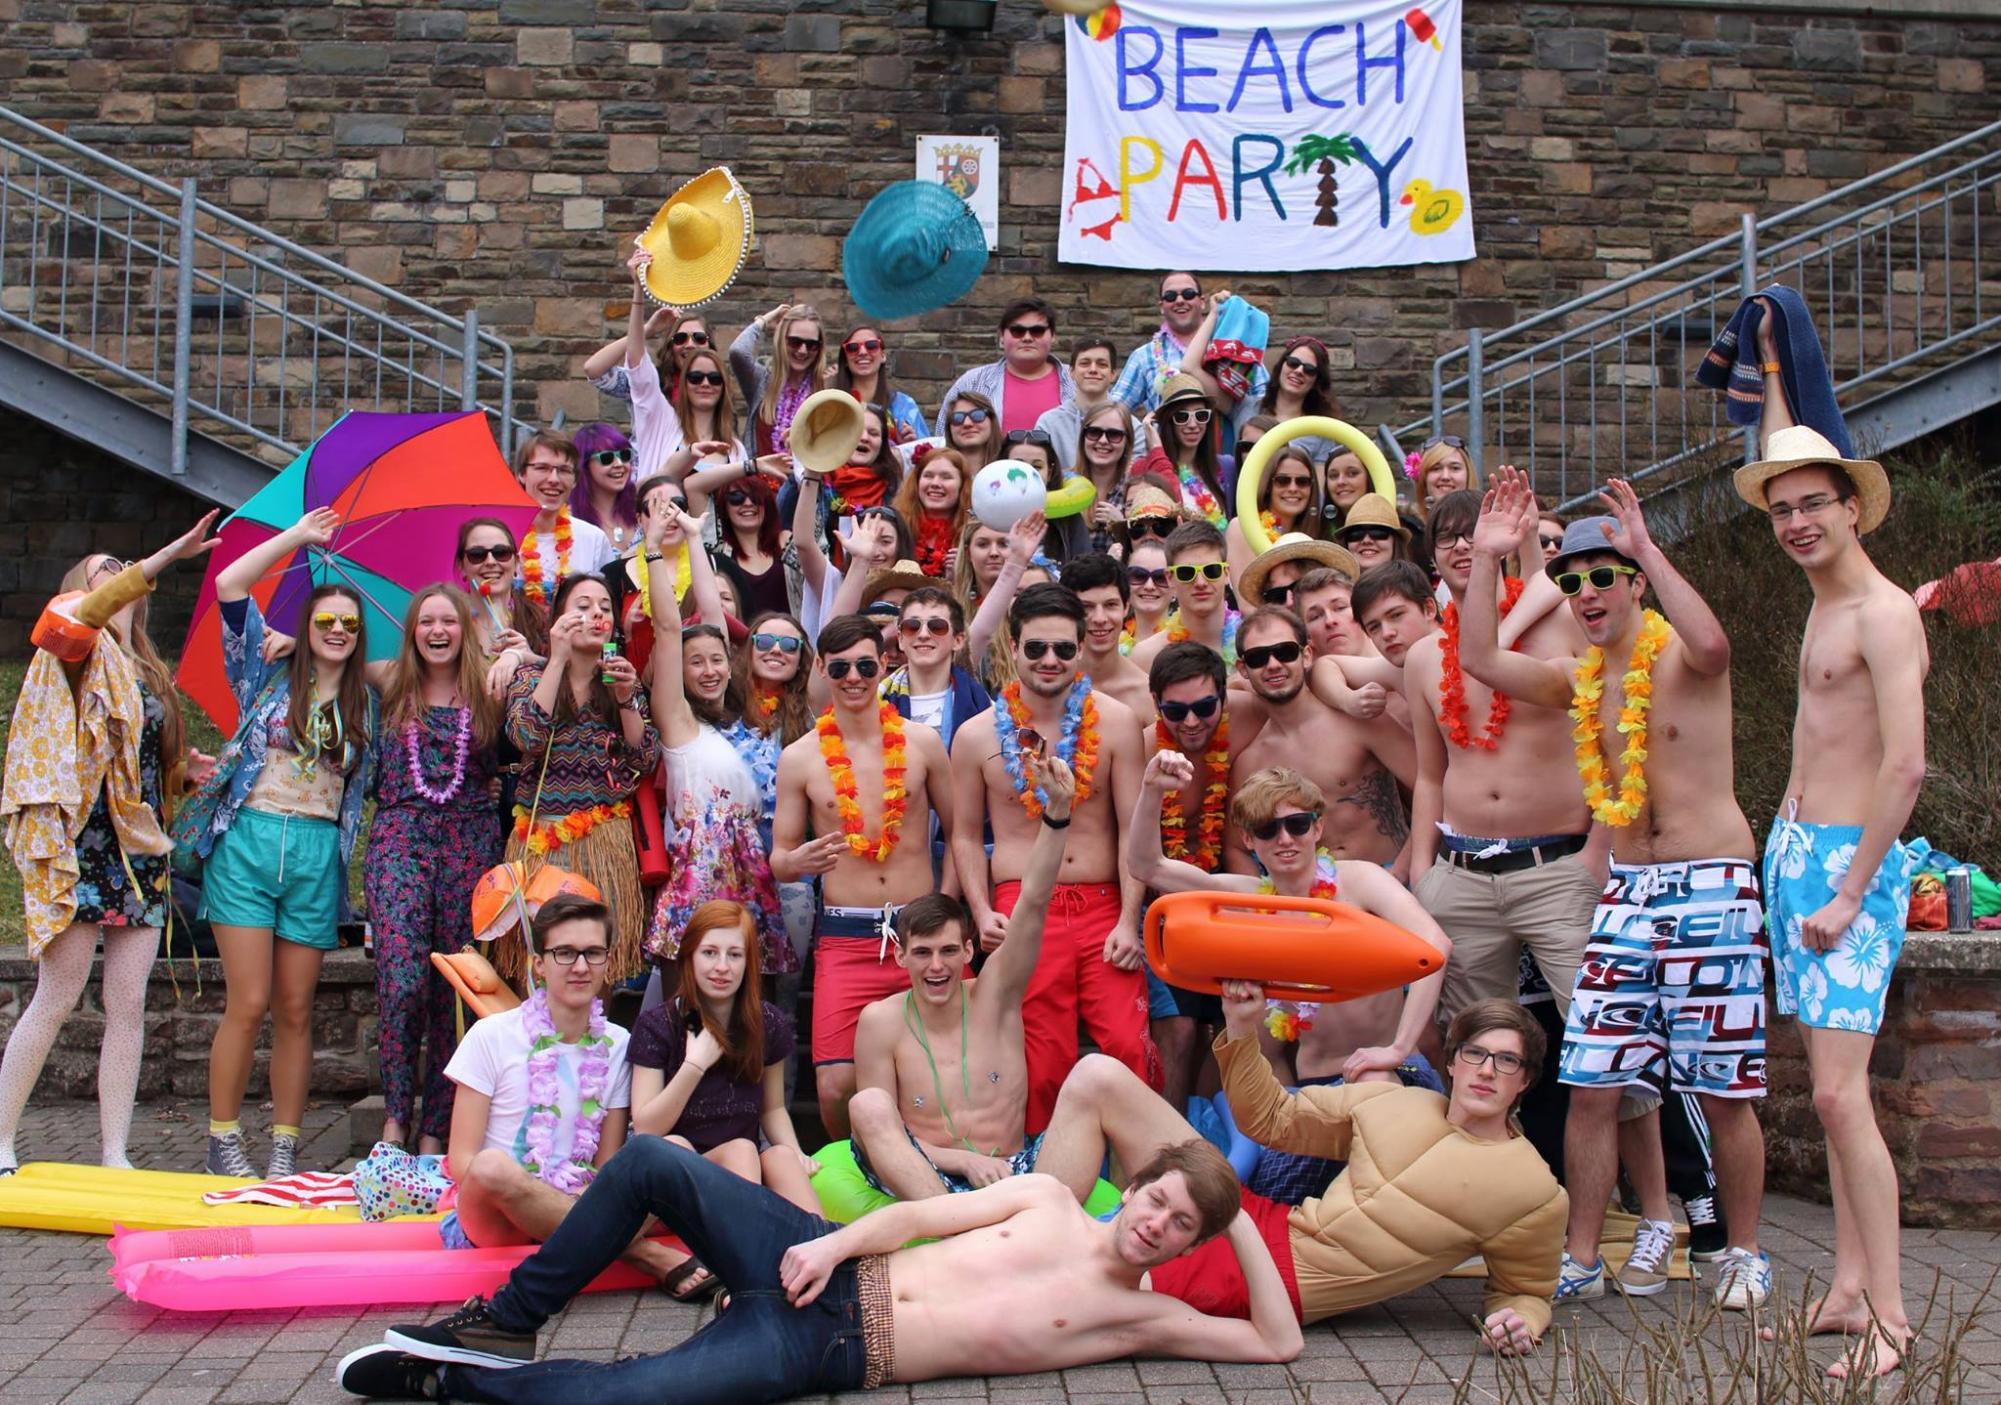 Beachparty. Mottowoche Abi 2015 - Heute war Tag vier - St